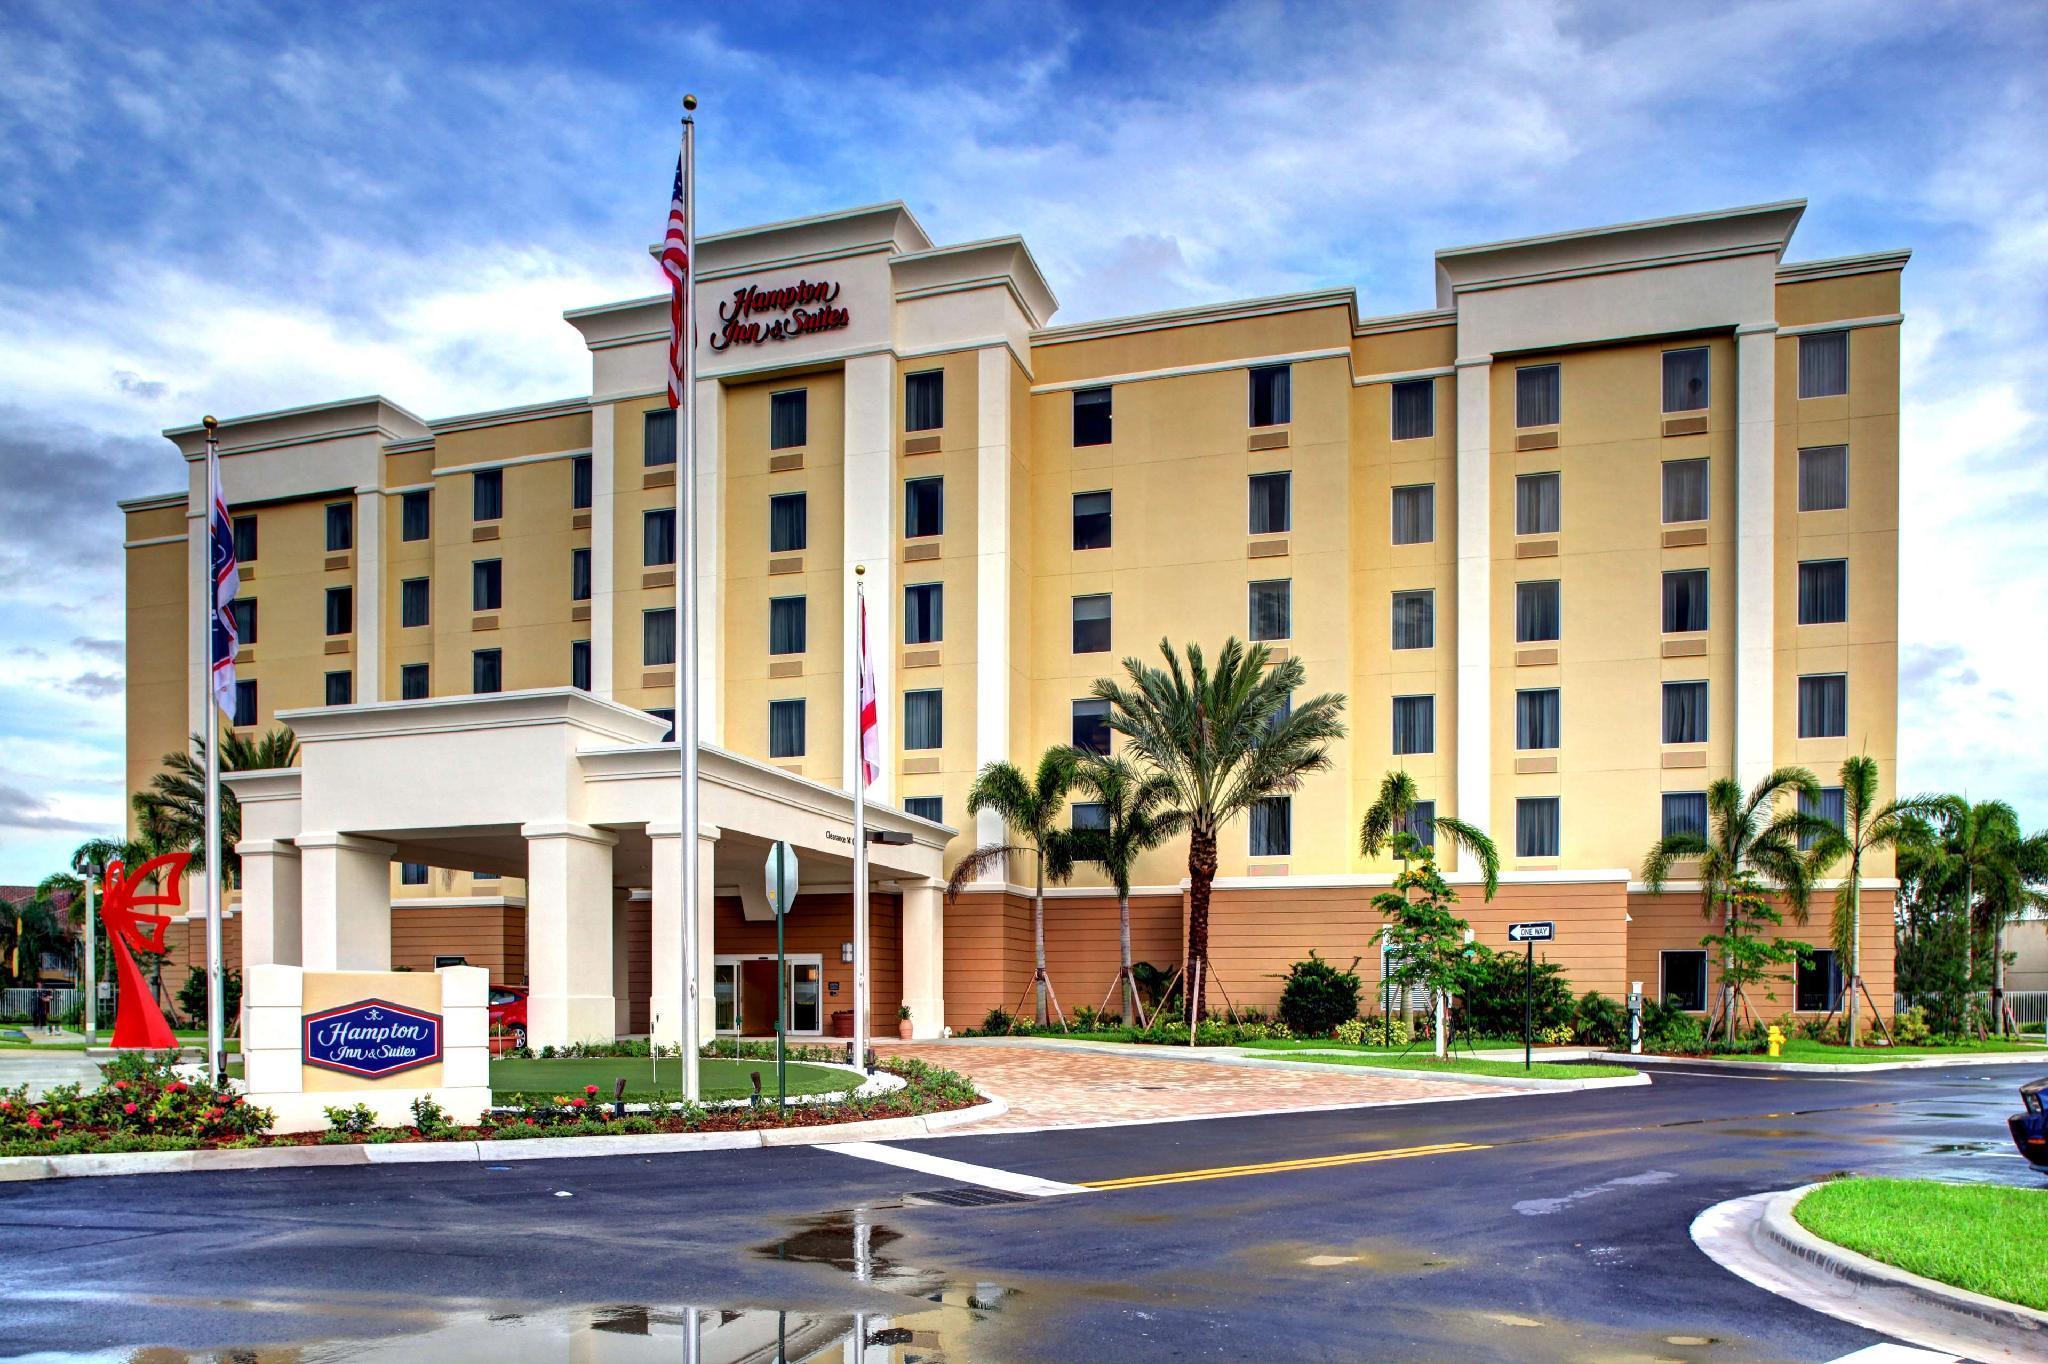 Hampton Inn And Suites Coconut Creek FL